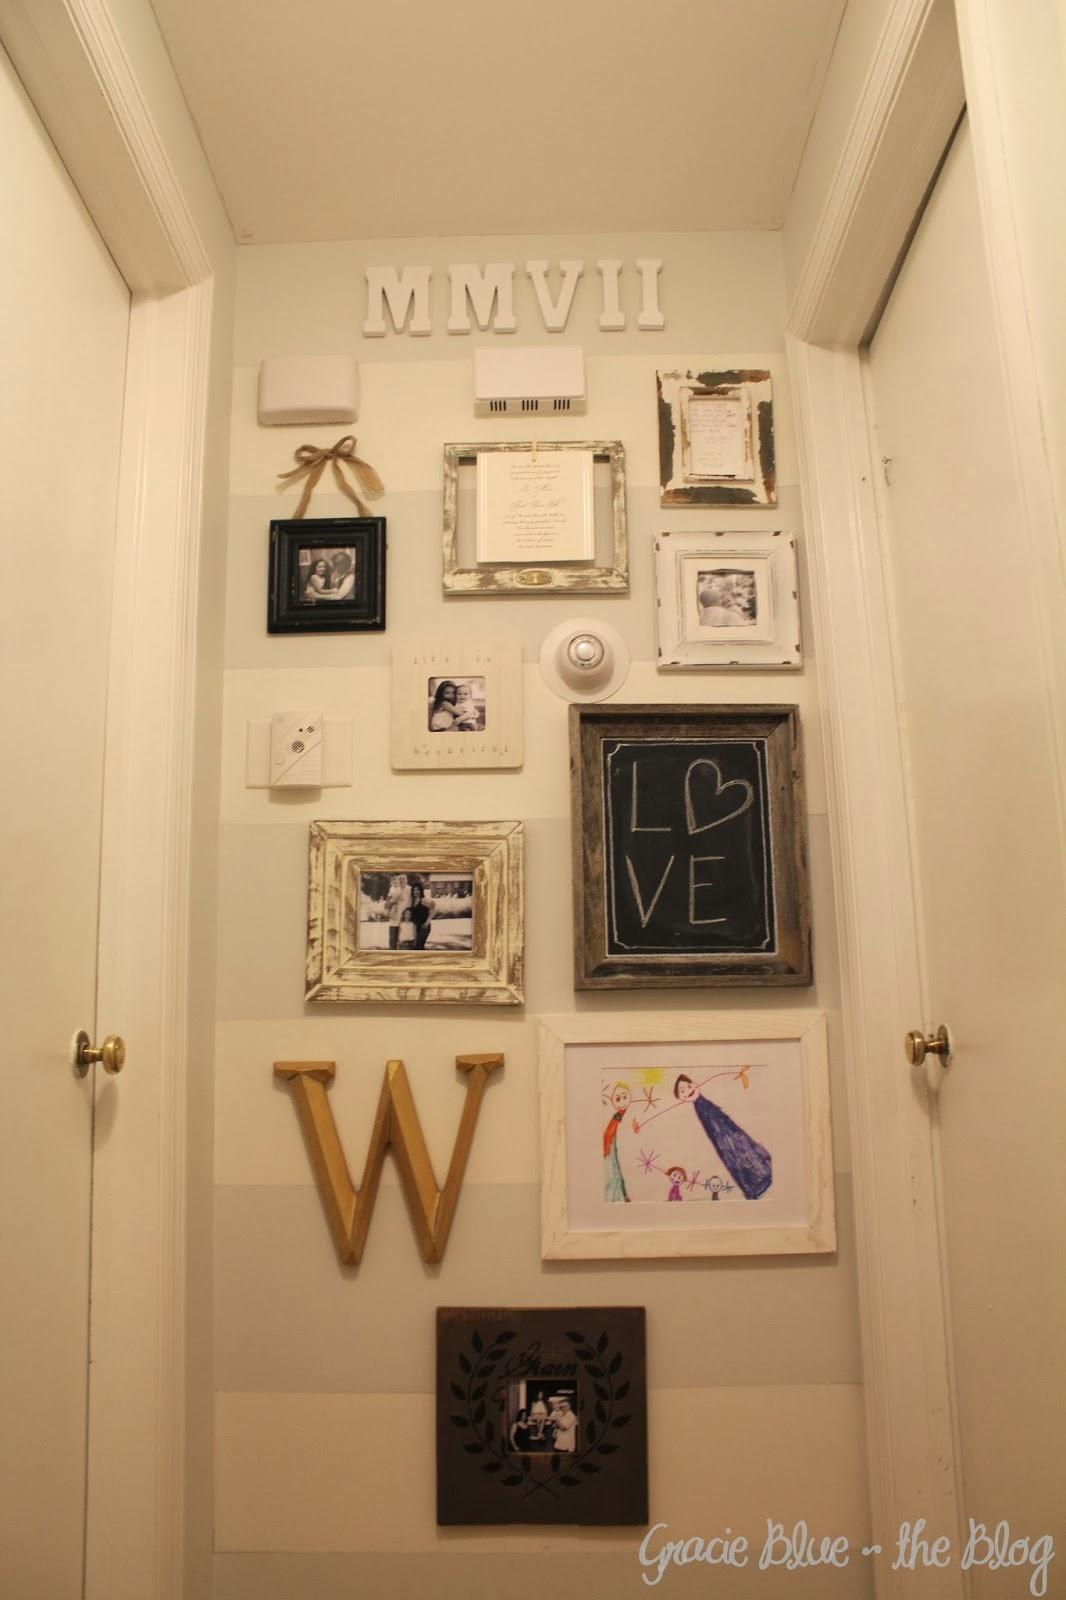 Gracie Blue : Rustic DIY Wedding Invite Display & Hallway Gallery ...